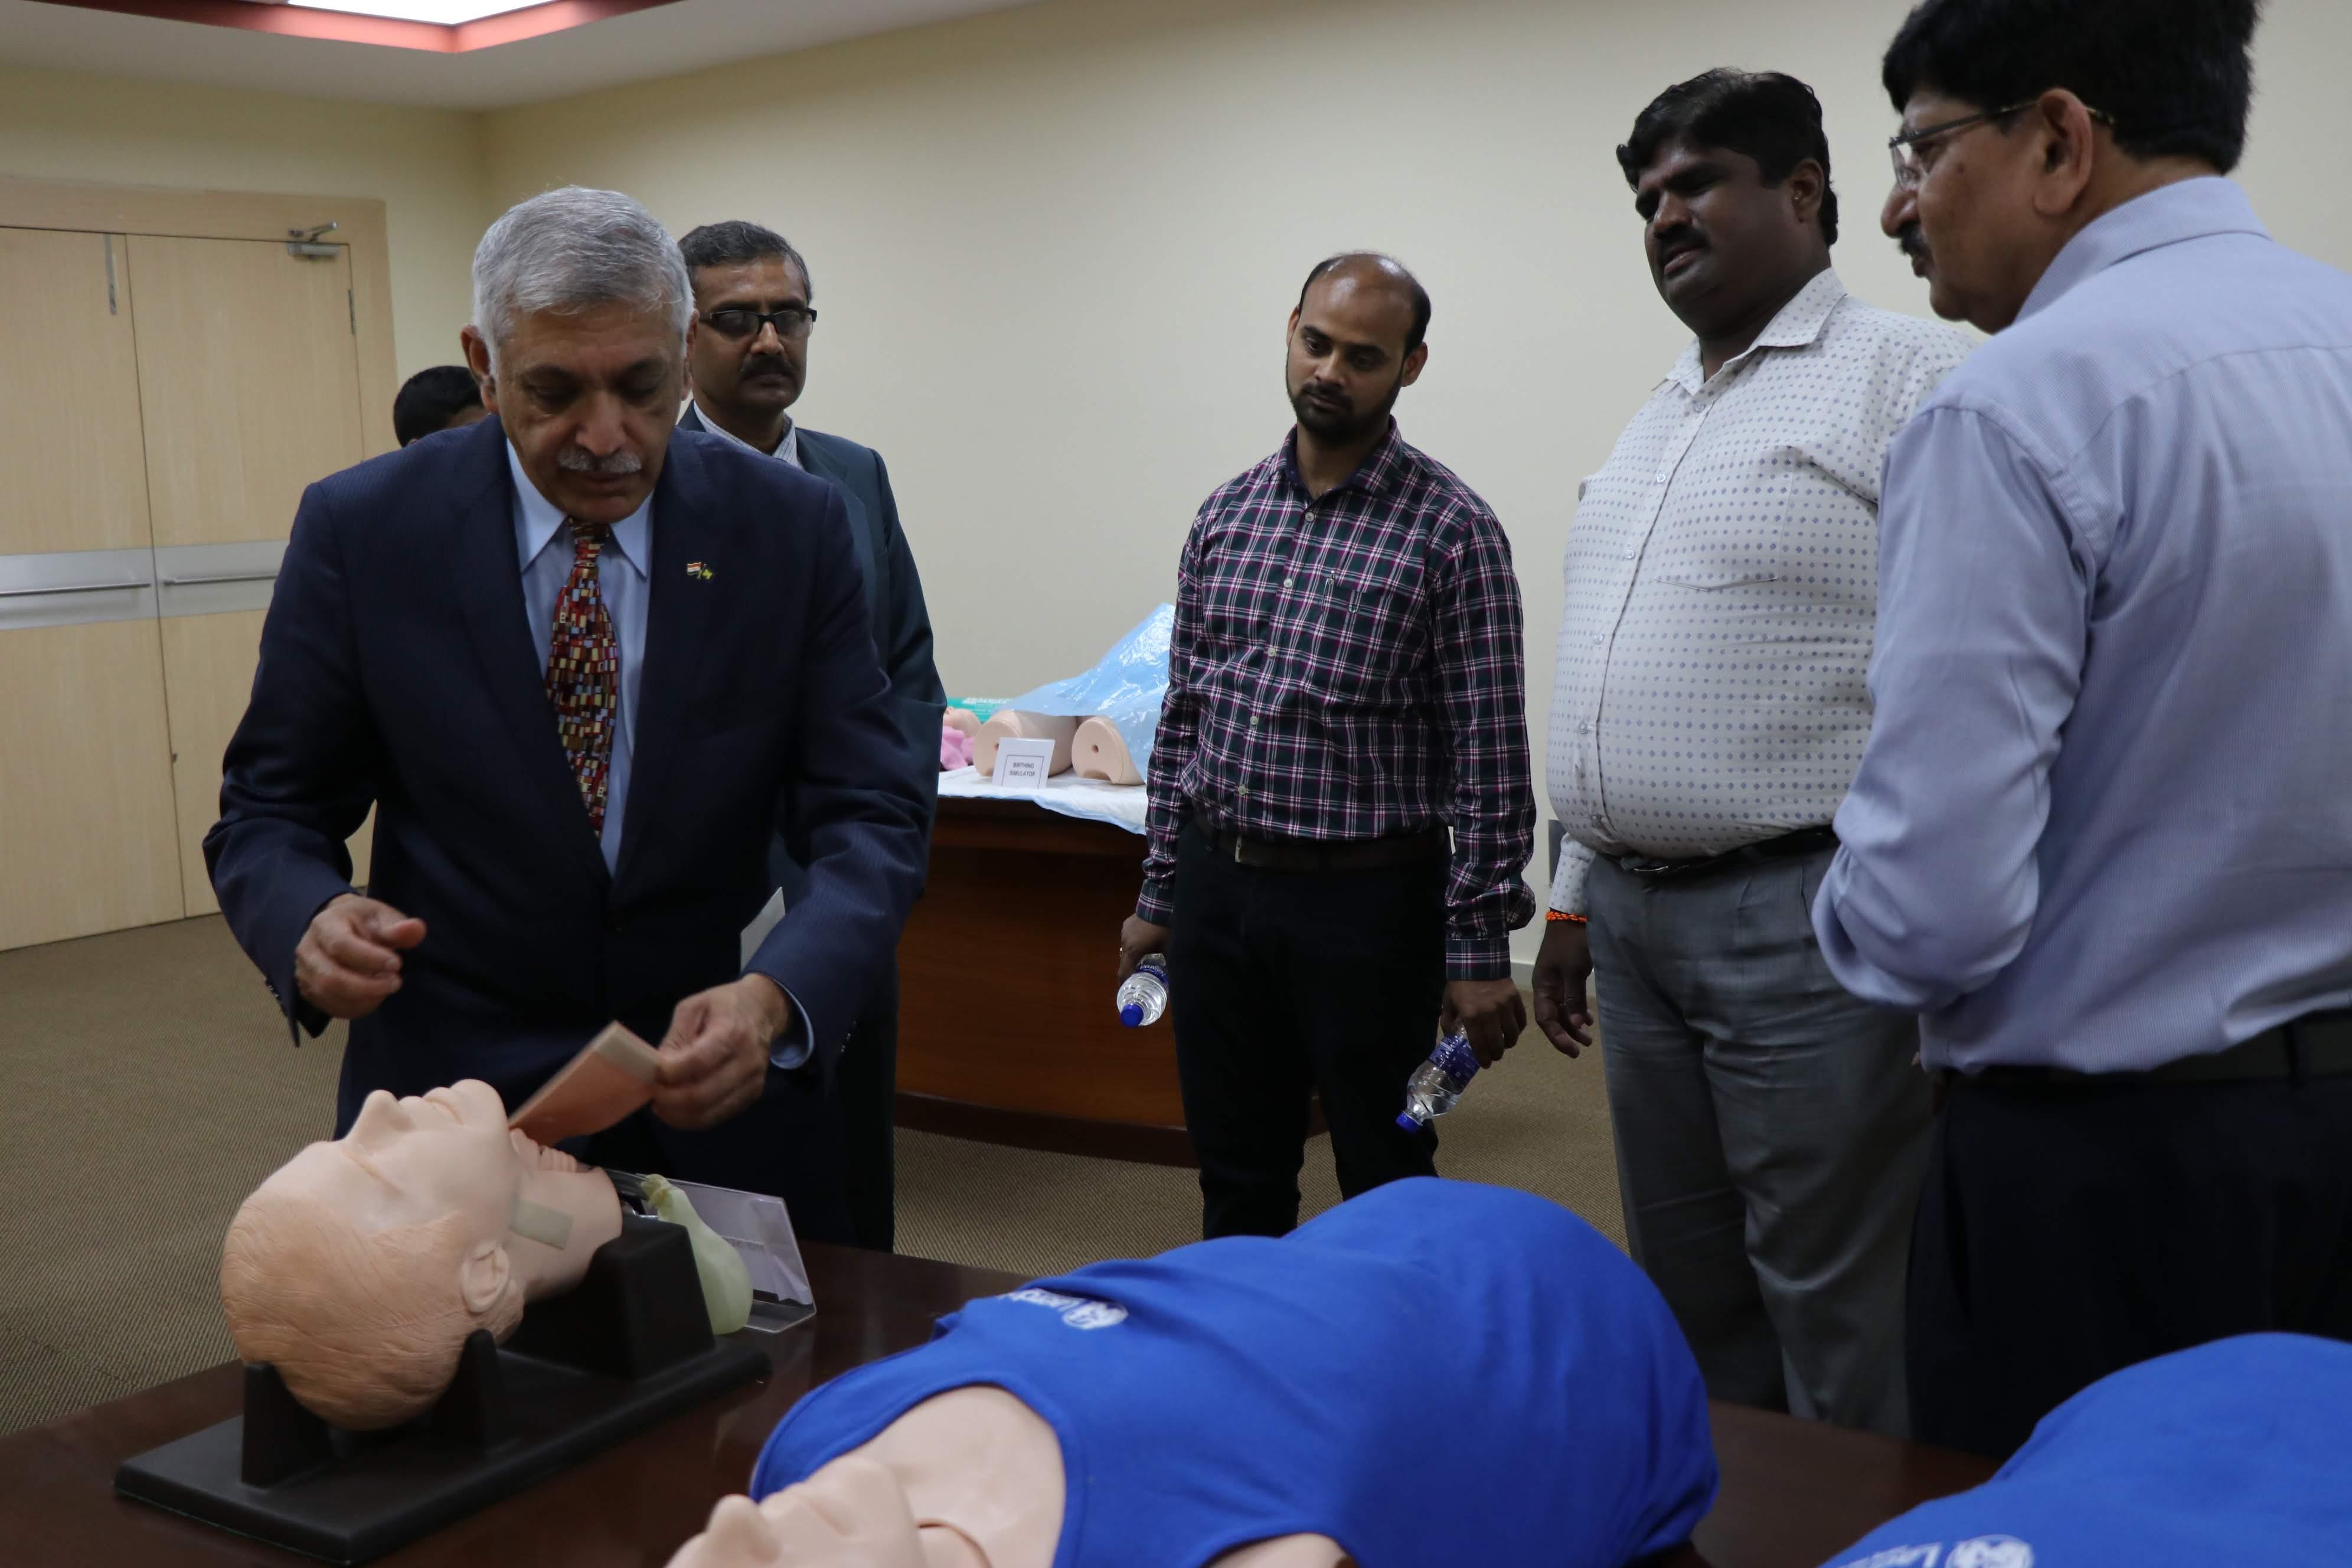 U-M Medical School researcher Krishnan Raghvendran demonstrates a procedure to advanced Emergency medical technicians. Image credit: Krishnan Raghvendran